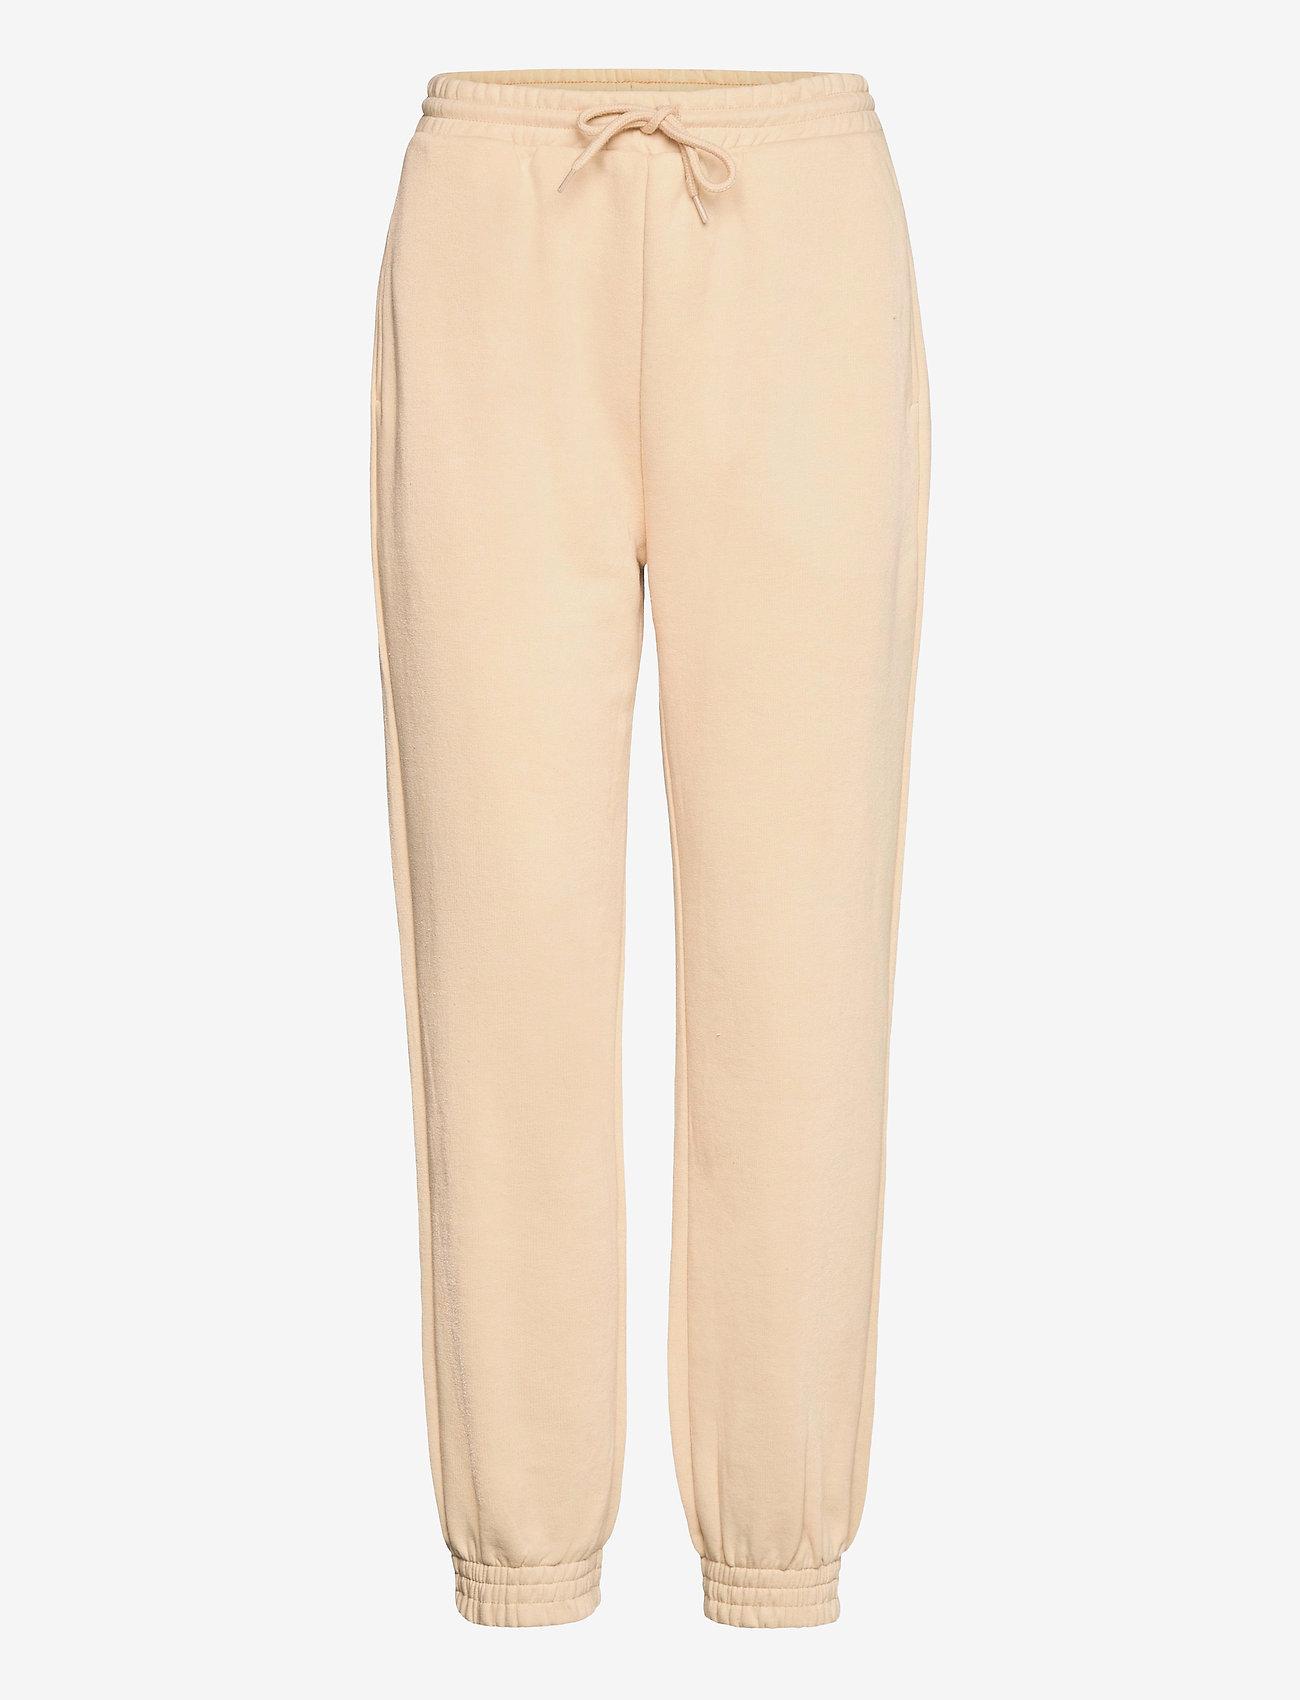 Modström - Holly pants - sweatpants - cream milk - 0